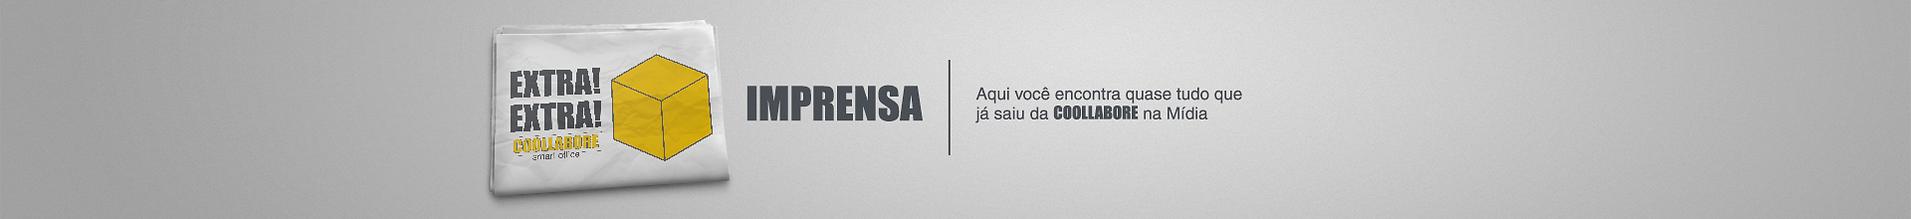 BANNER-IMPRENSA.png